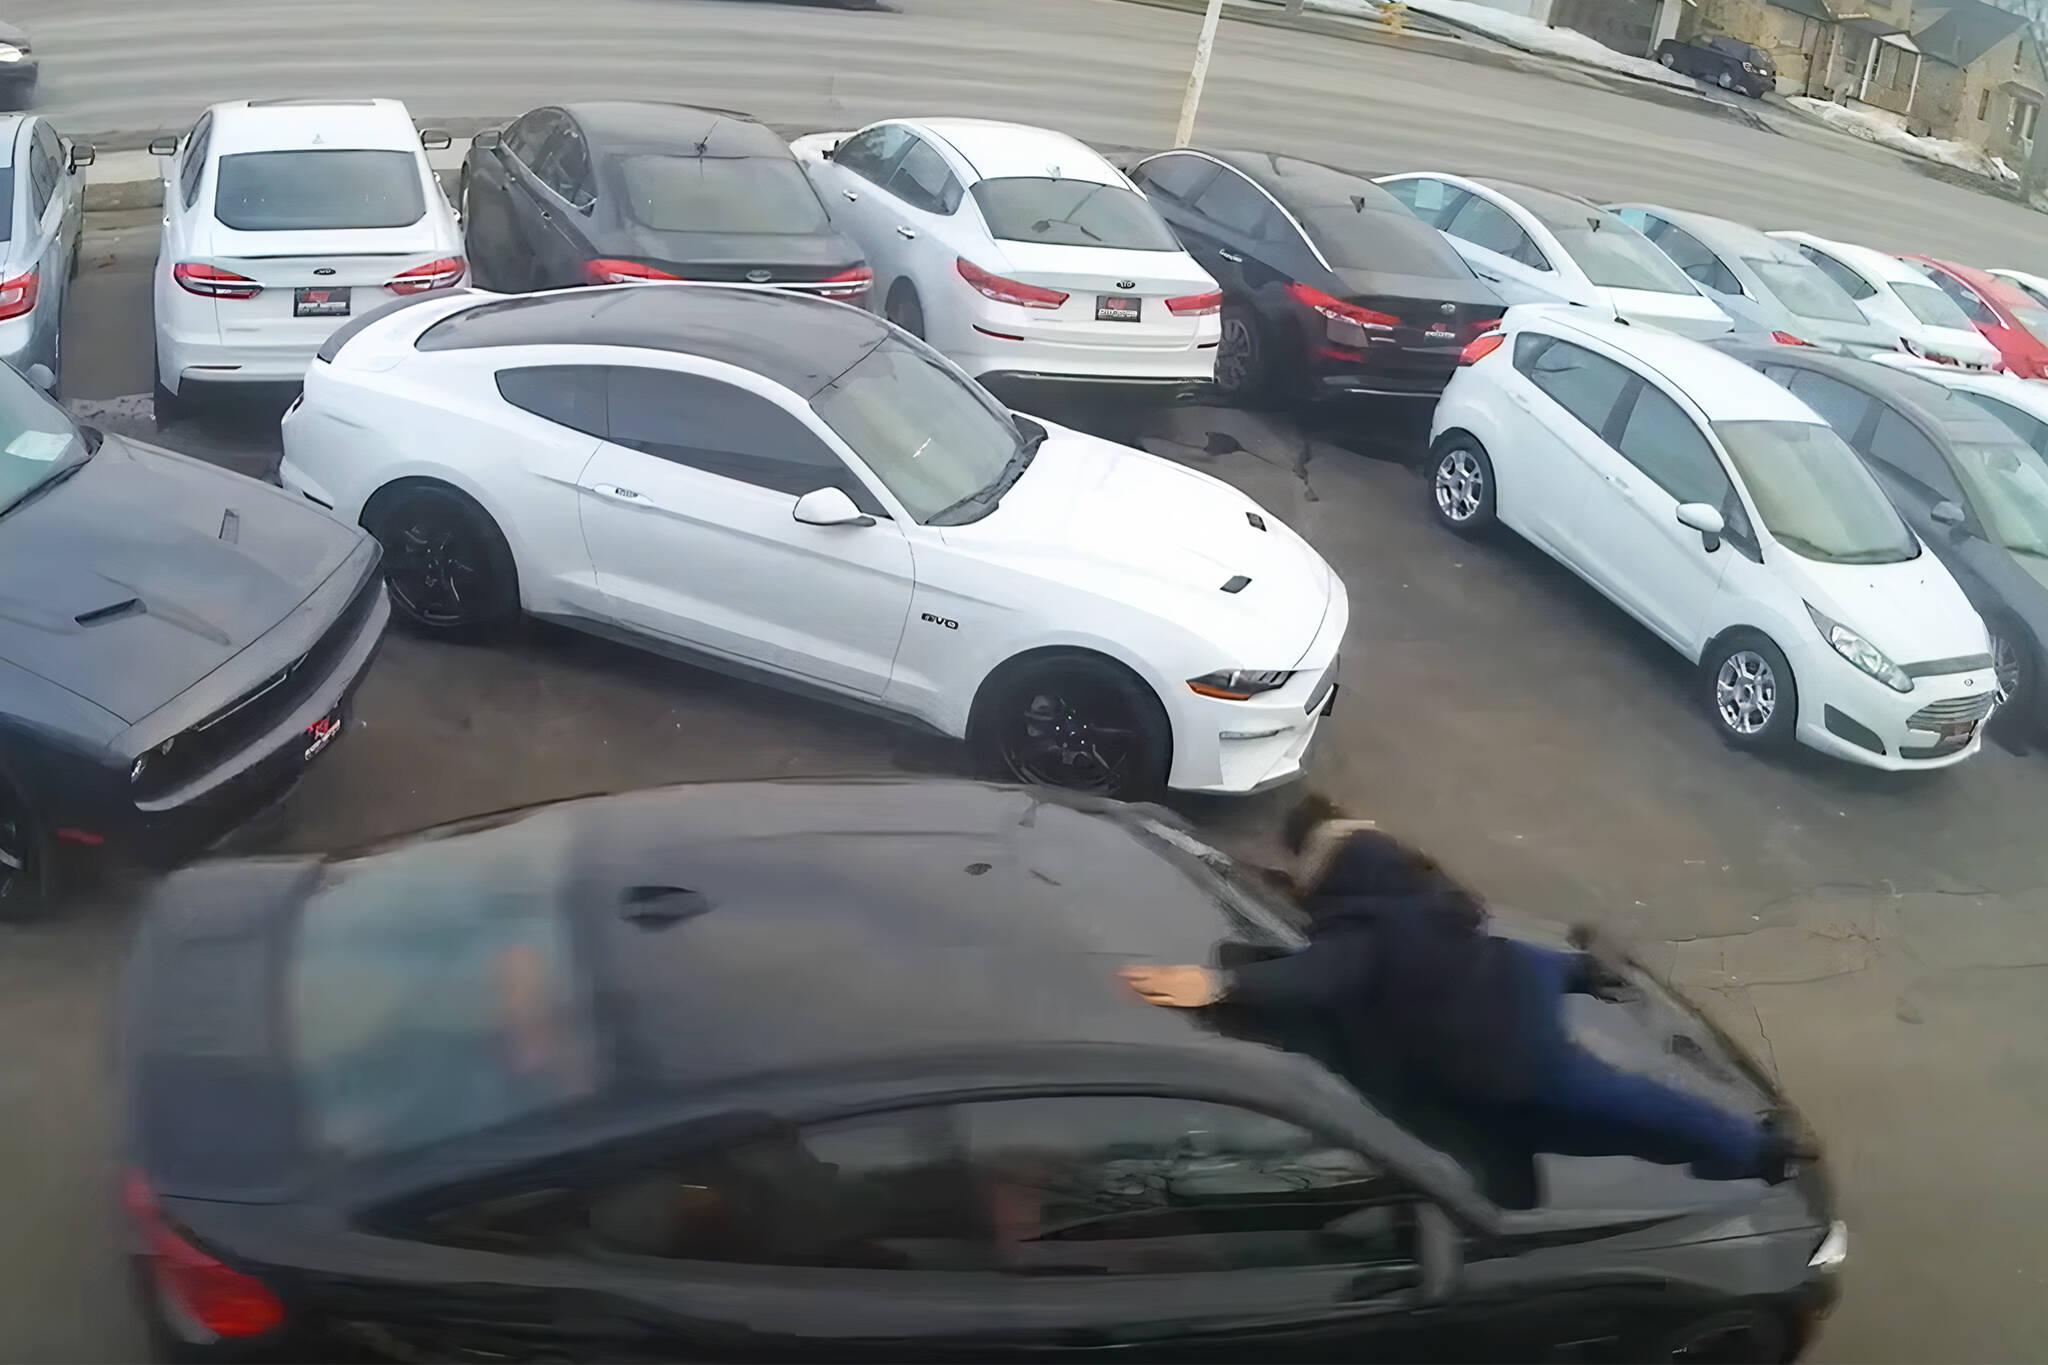 car theft london